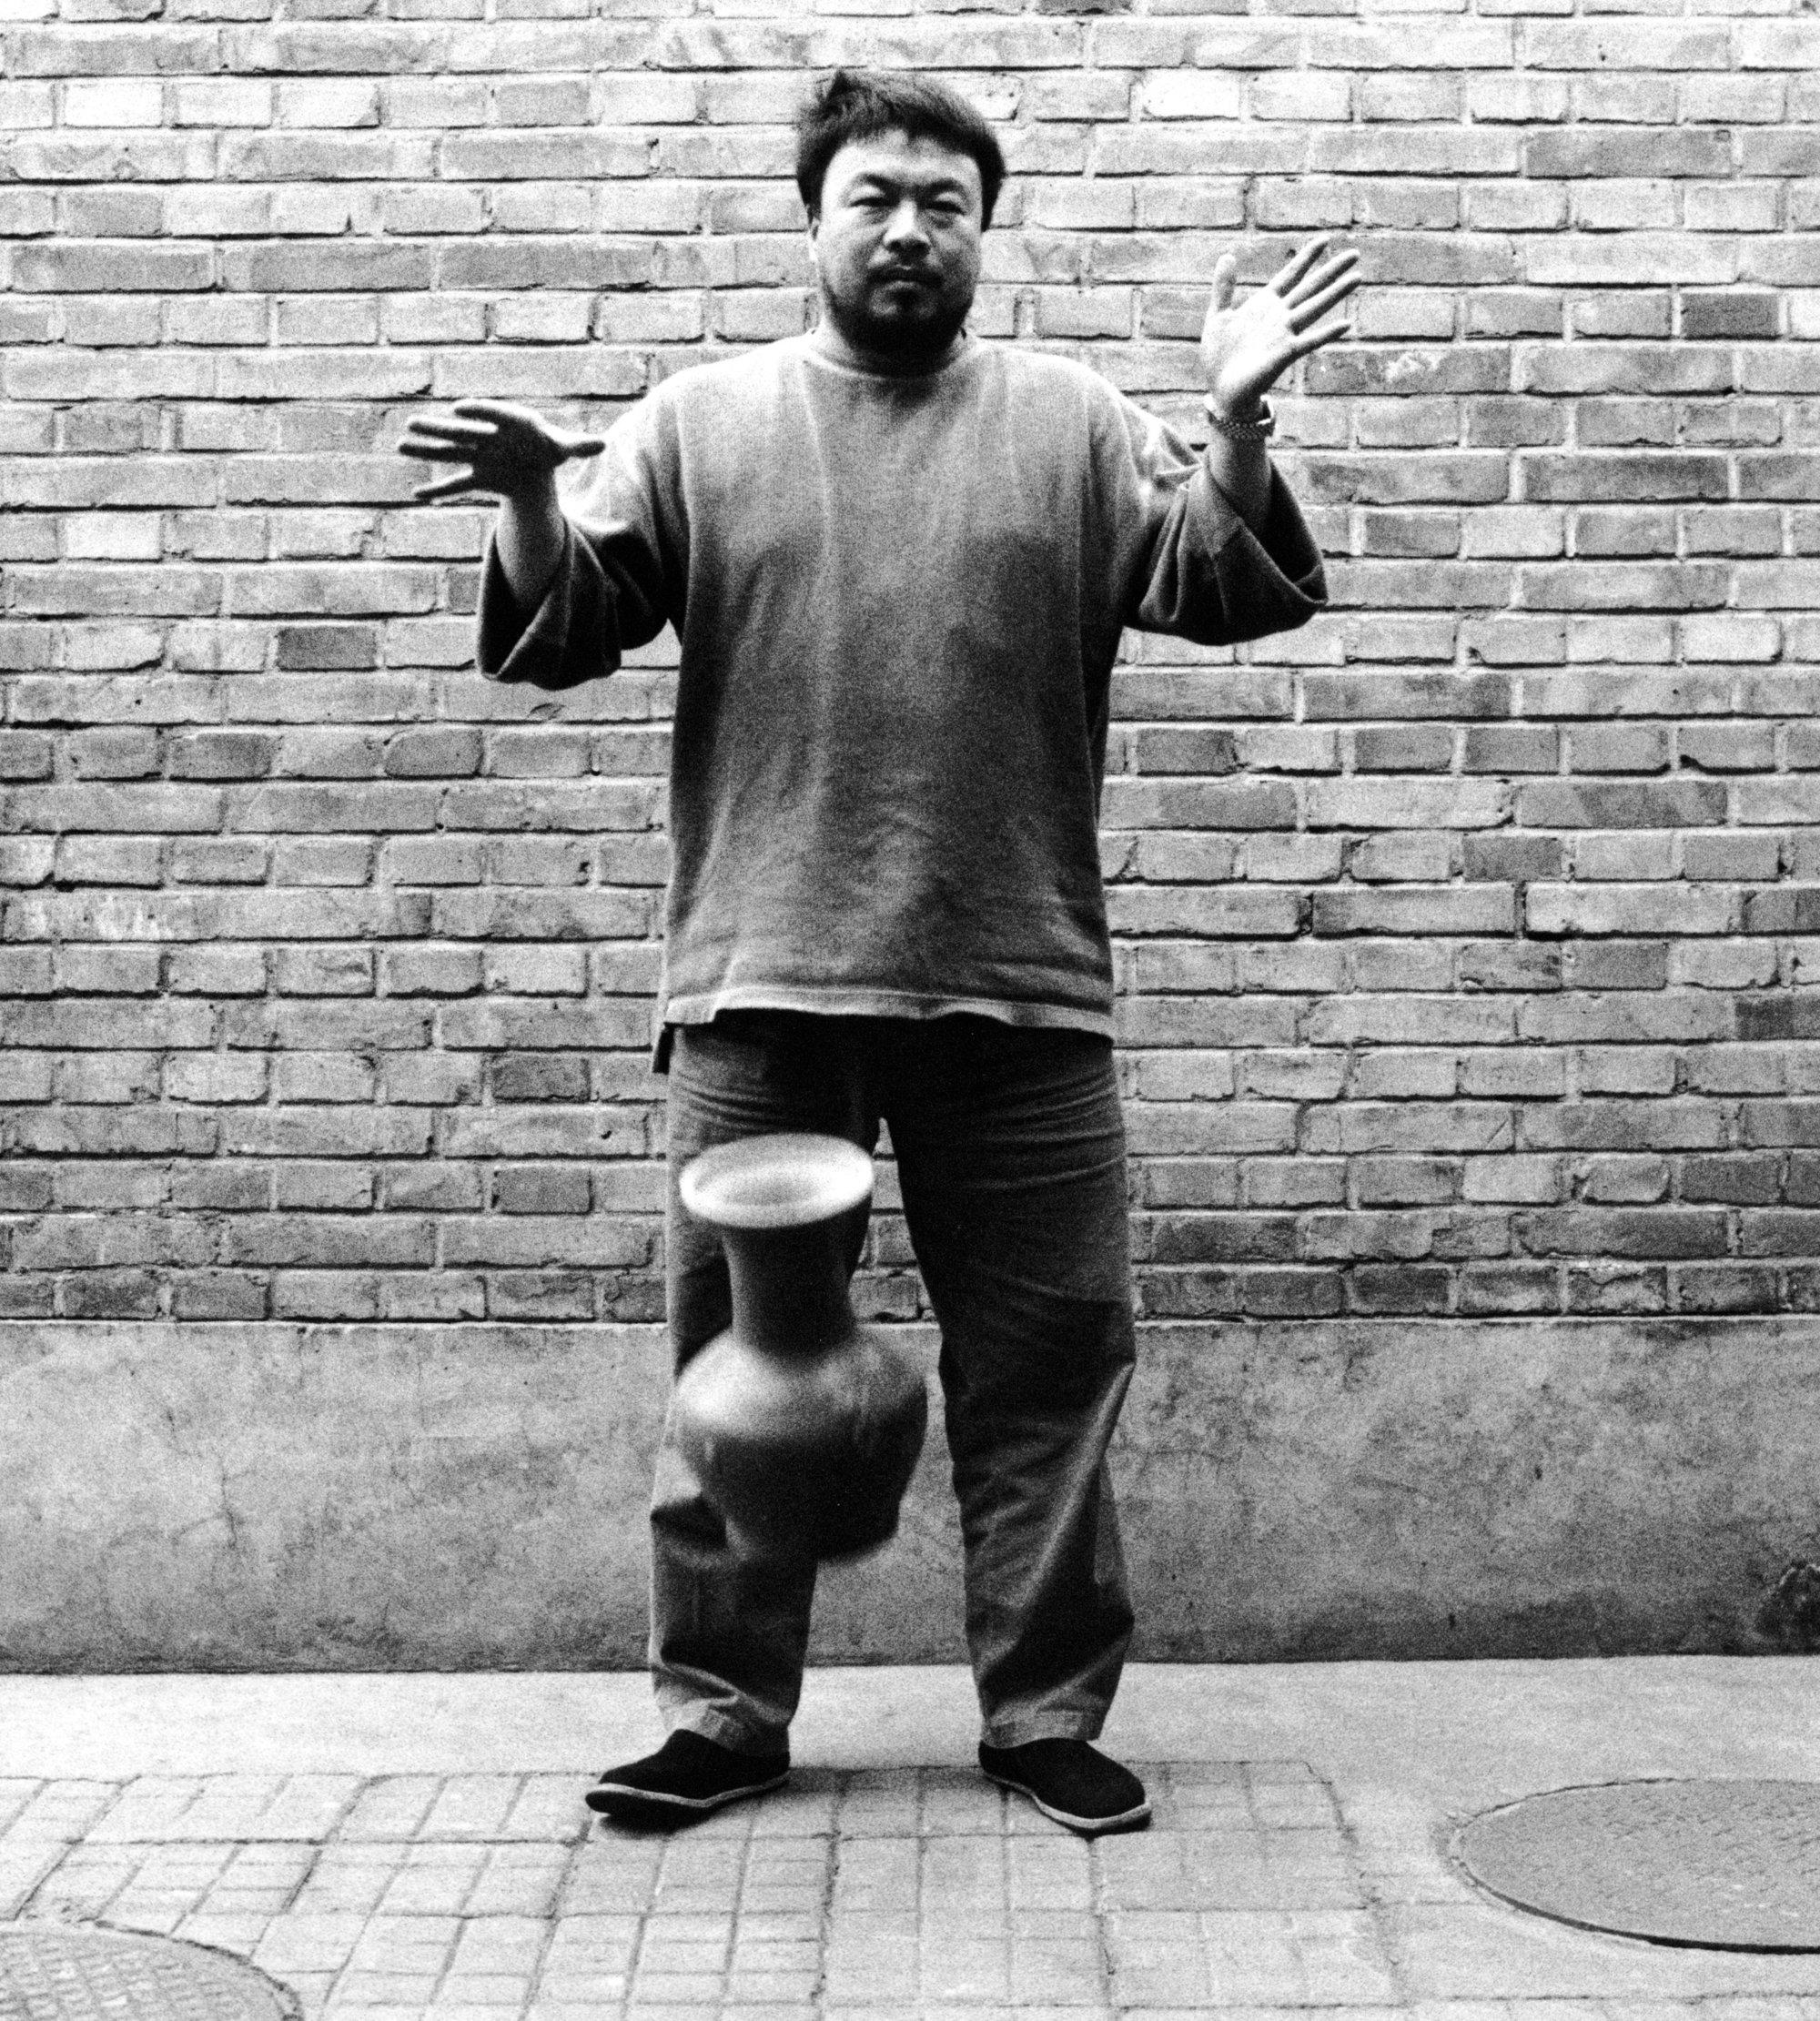 The Broken Million Dollar Vase Ai Weiwei Public Delivery